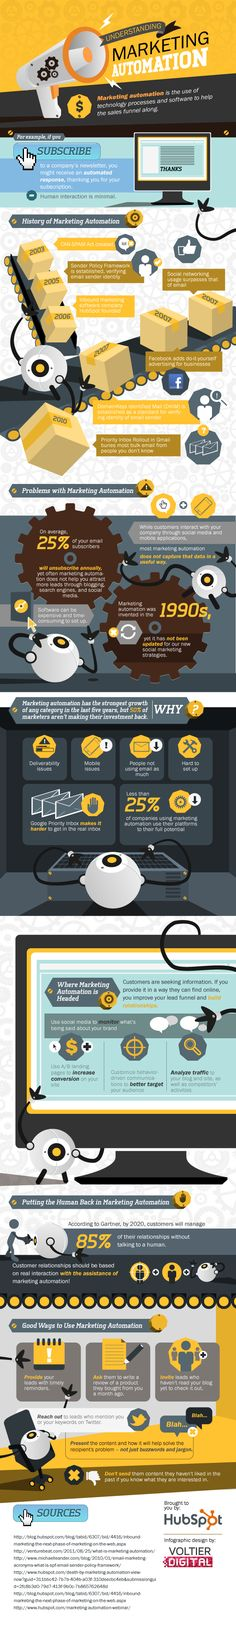 Qué es el marketing automation #infografia #marketing